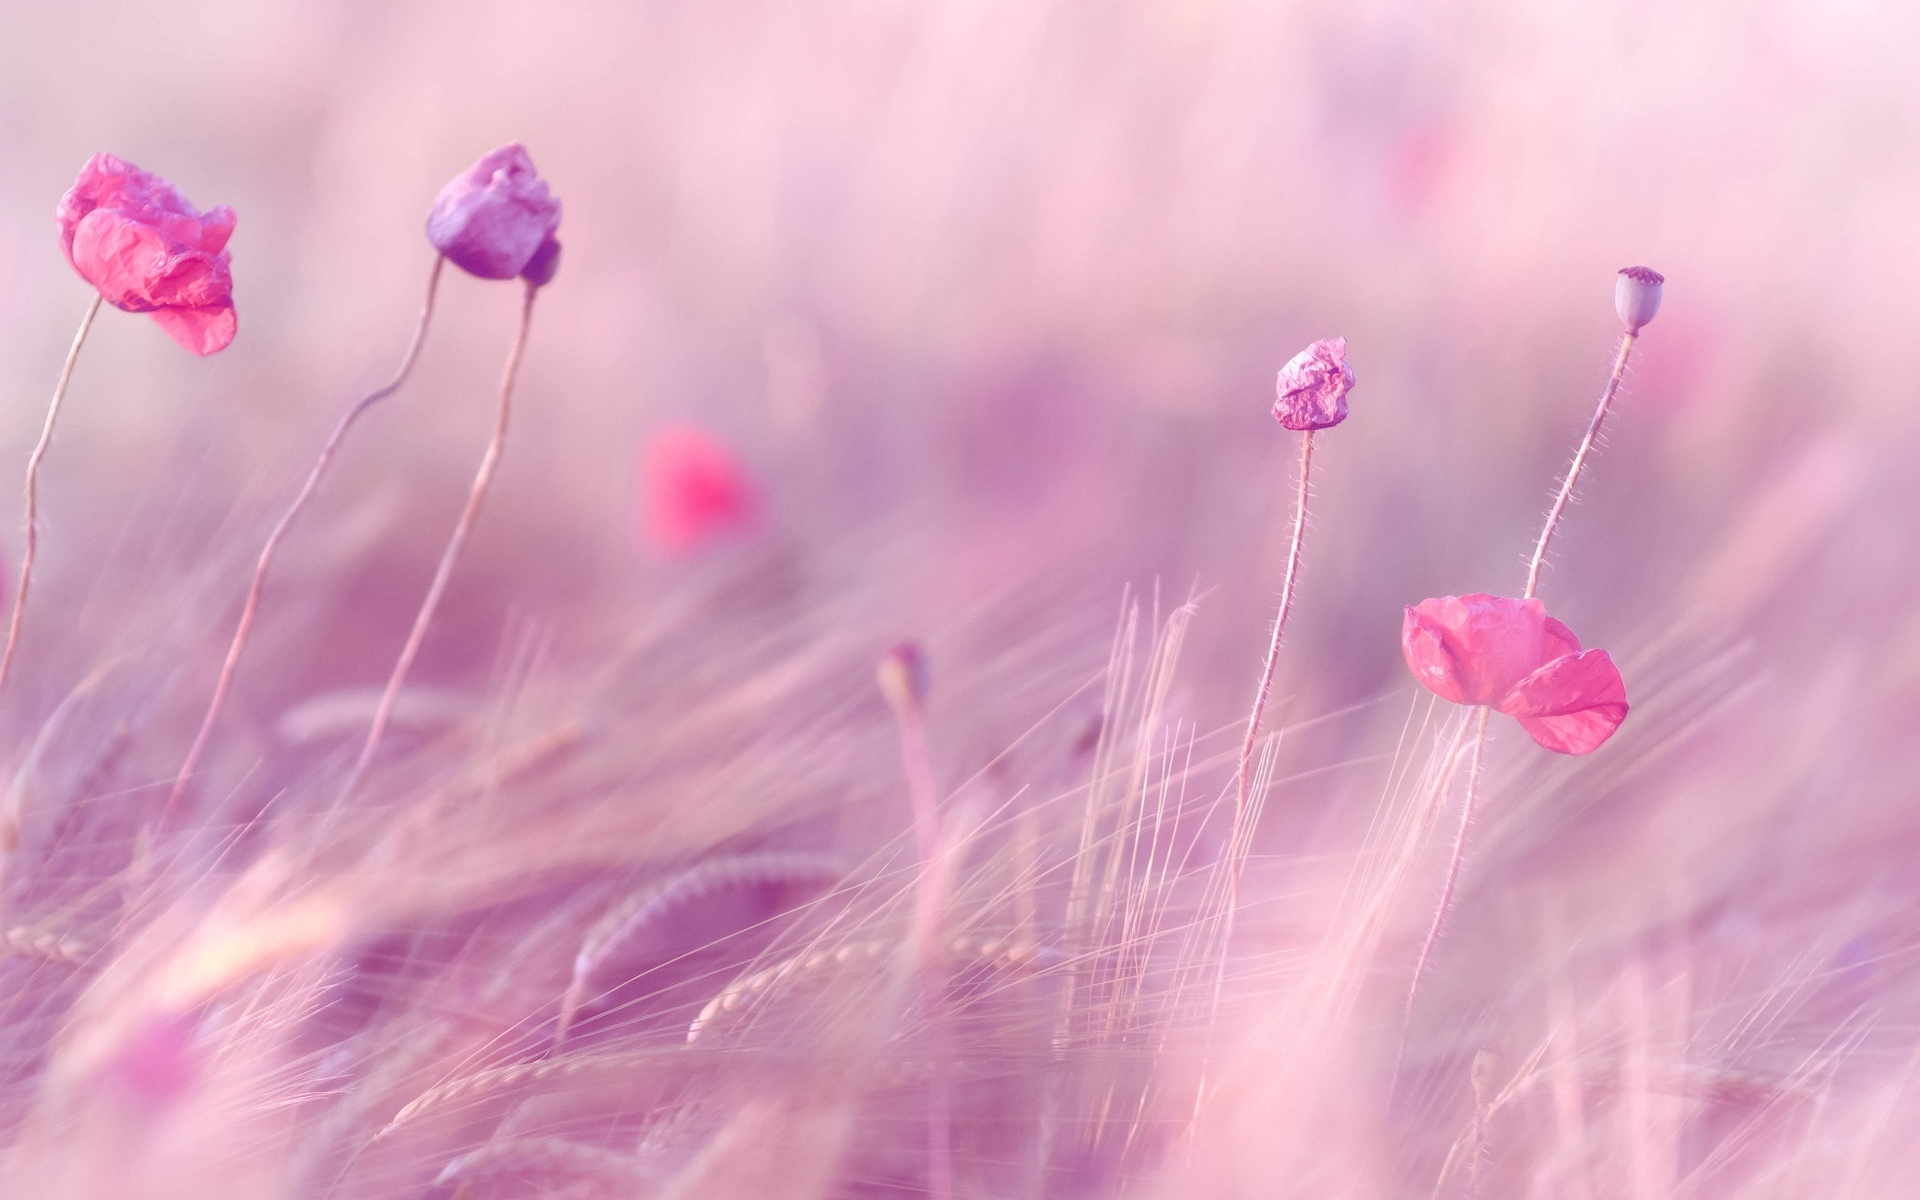 hd wallpaper pink rose